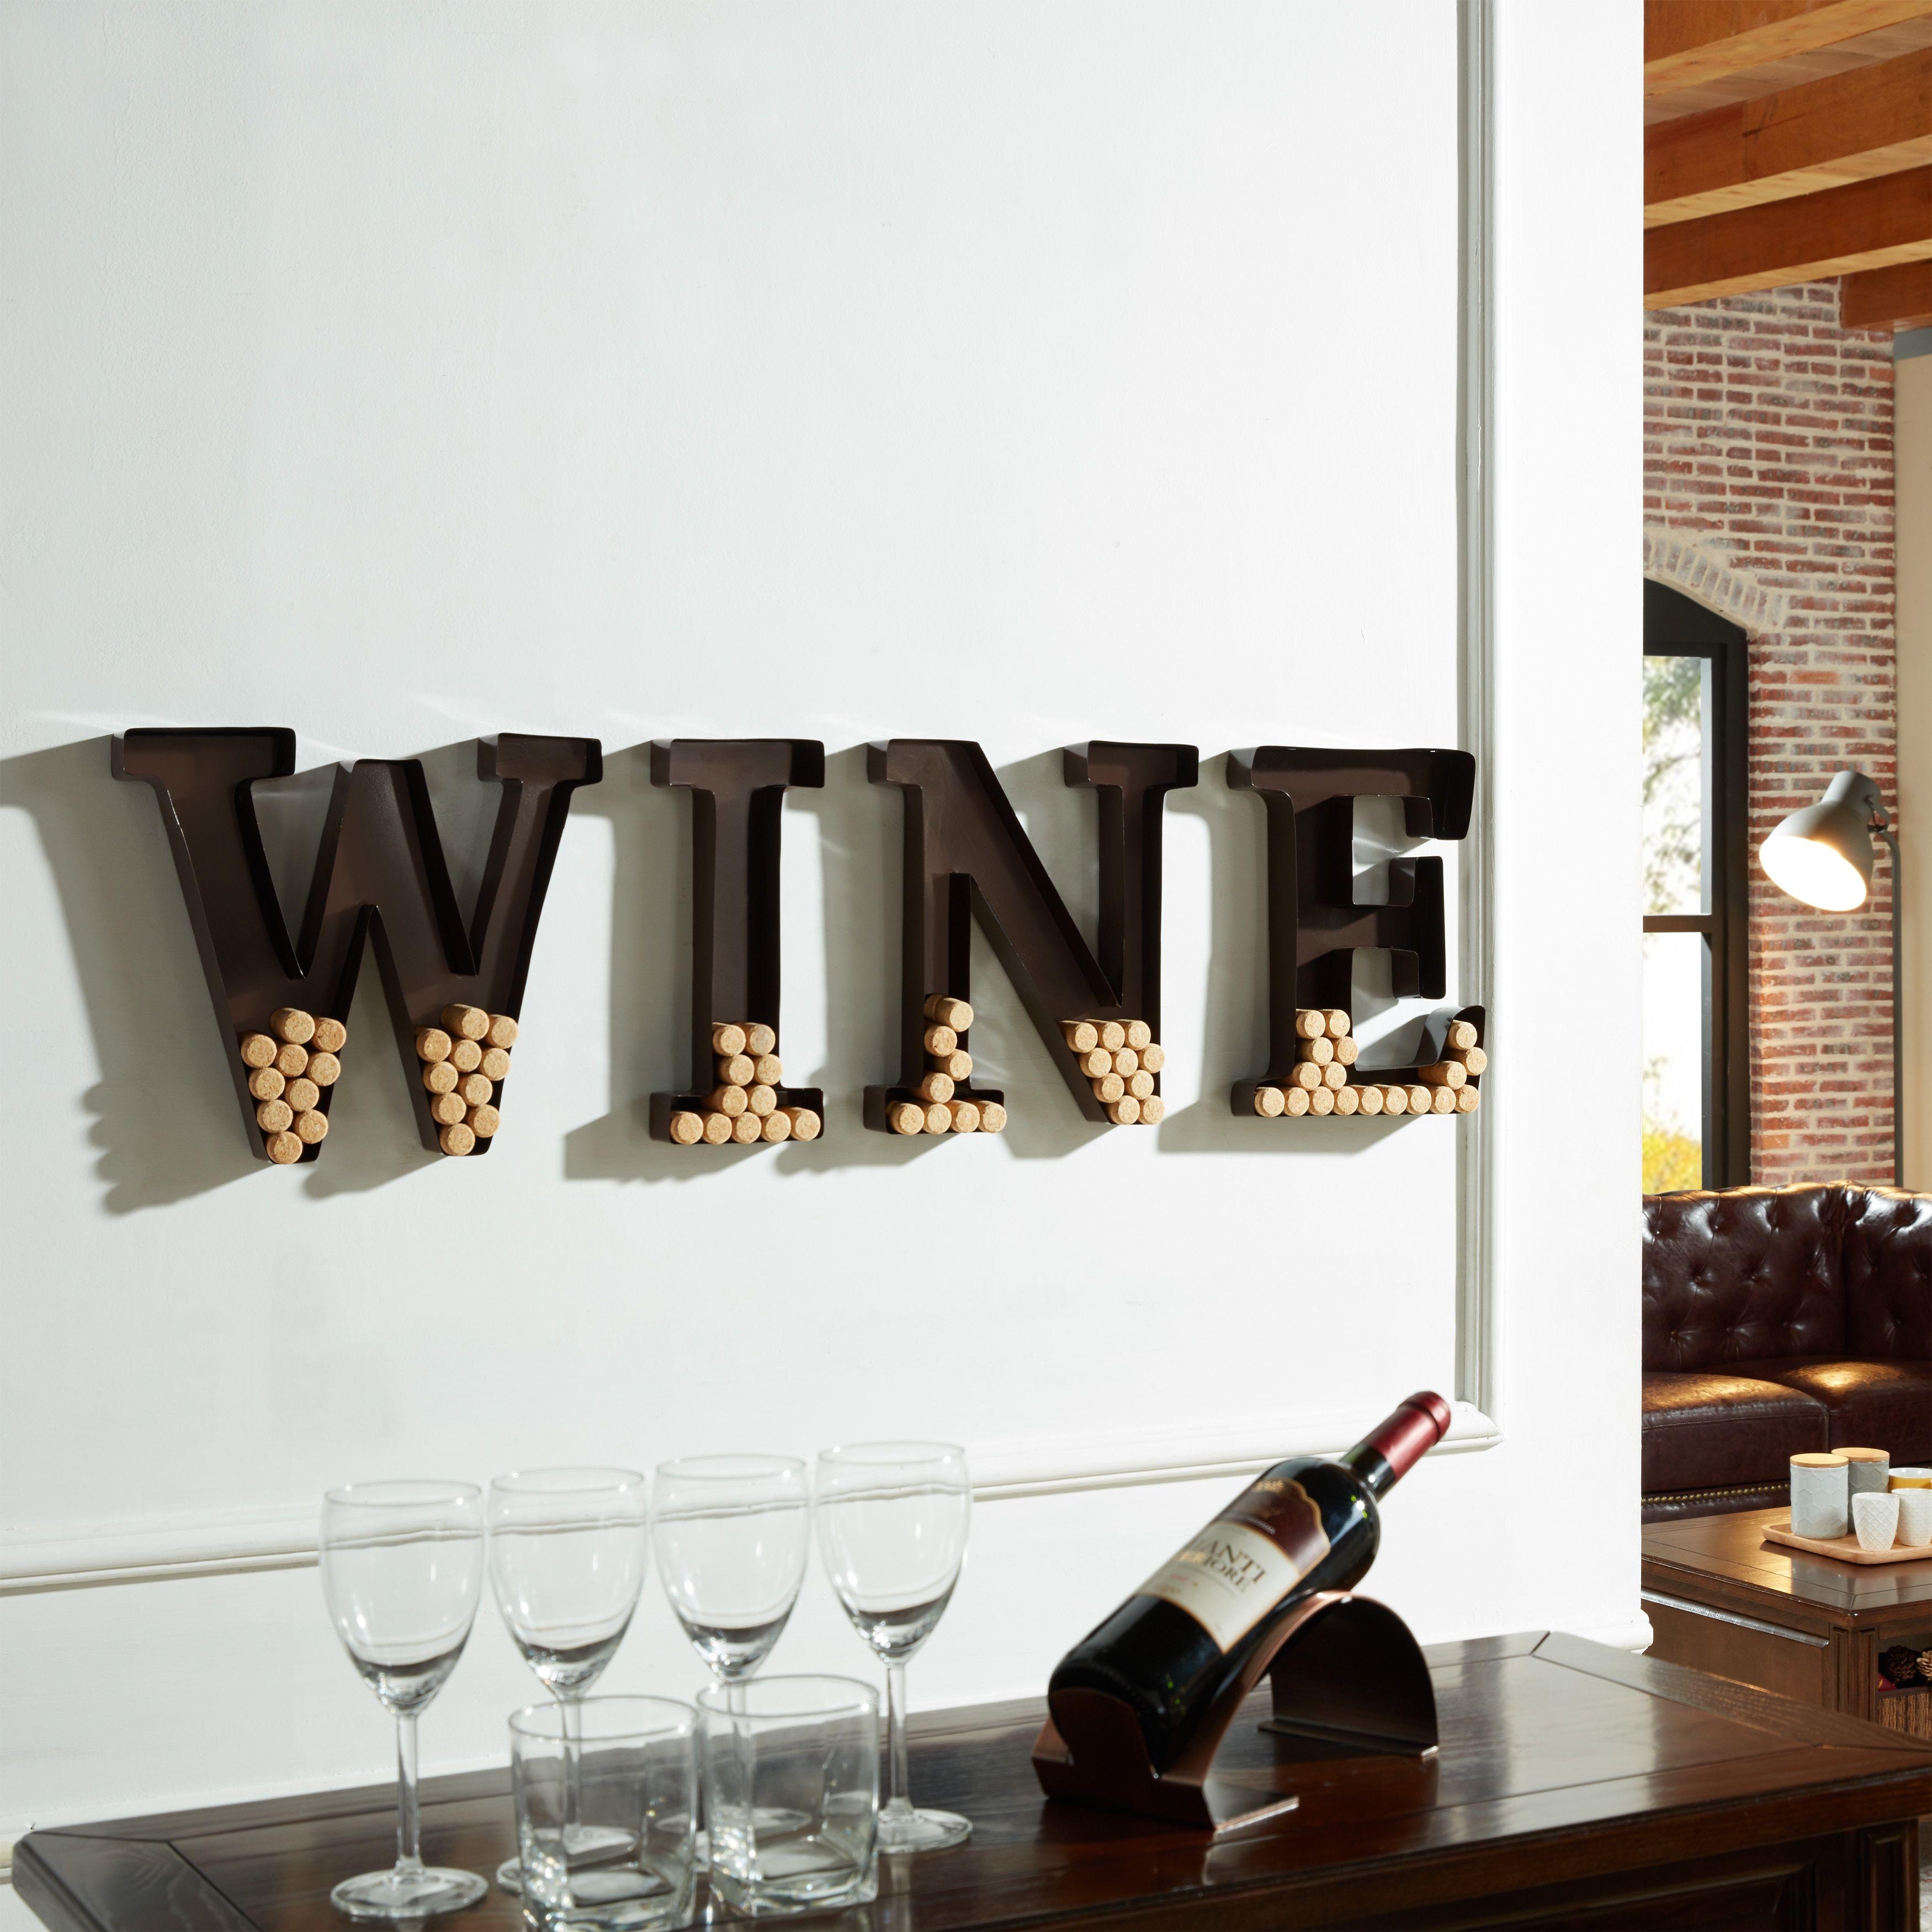 Danya b metal wall mount uwineu letters cork holder overstock